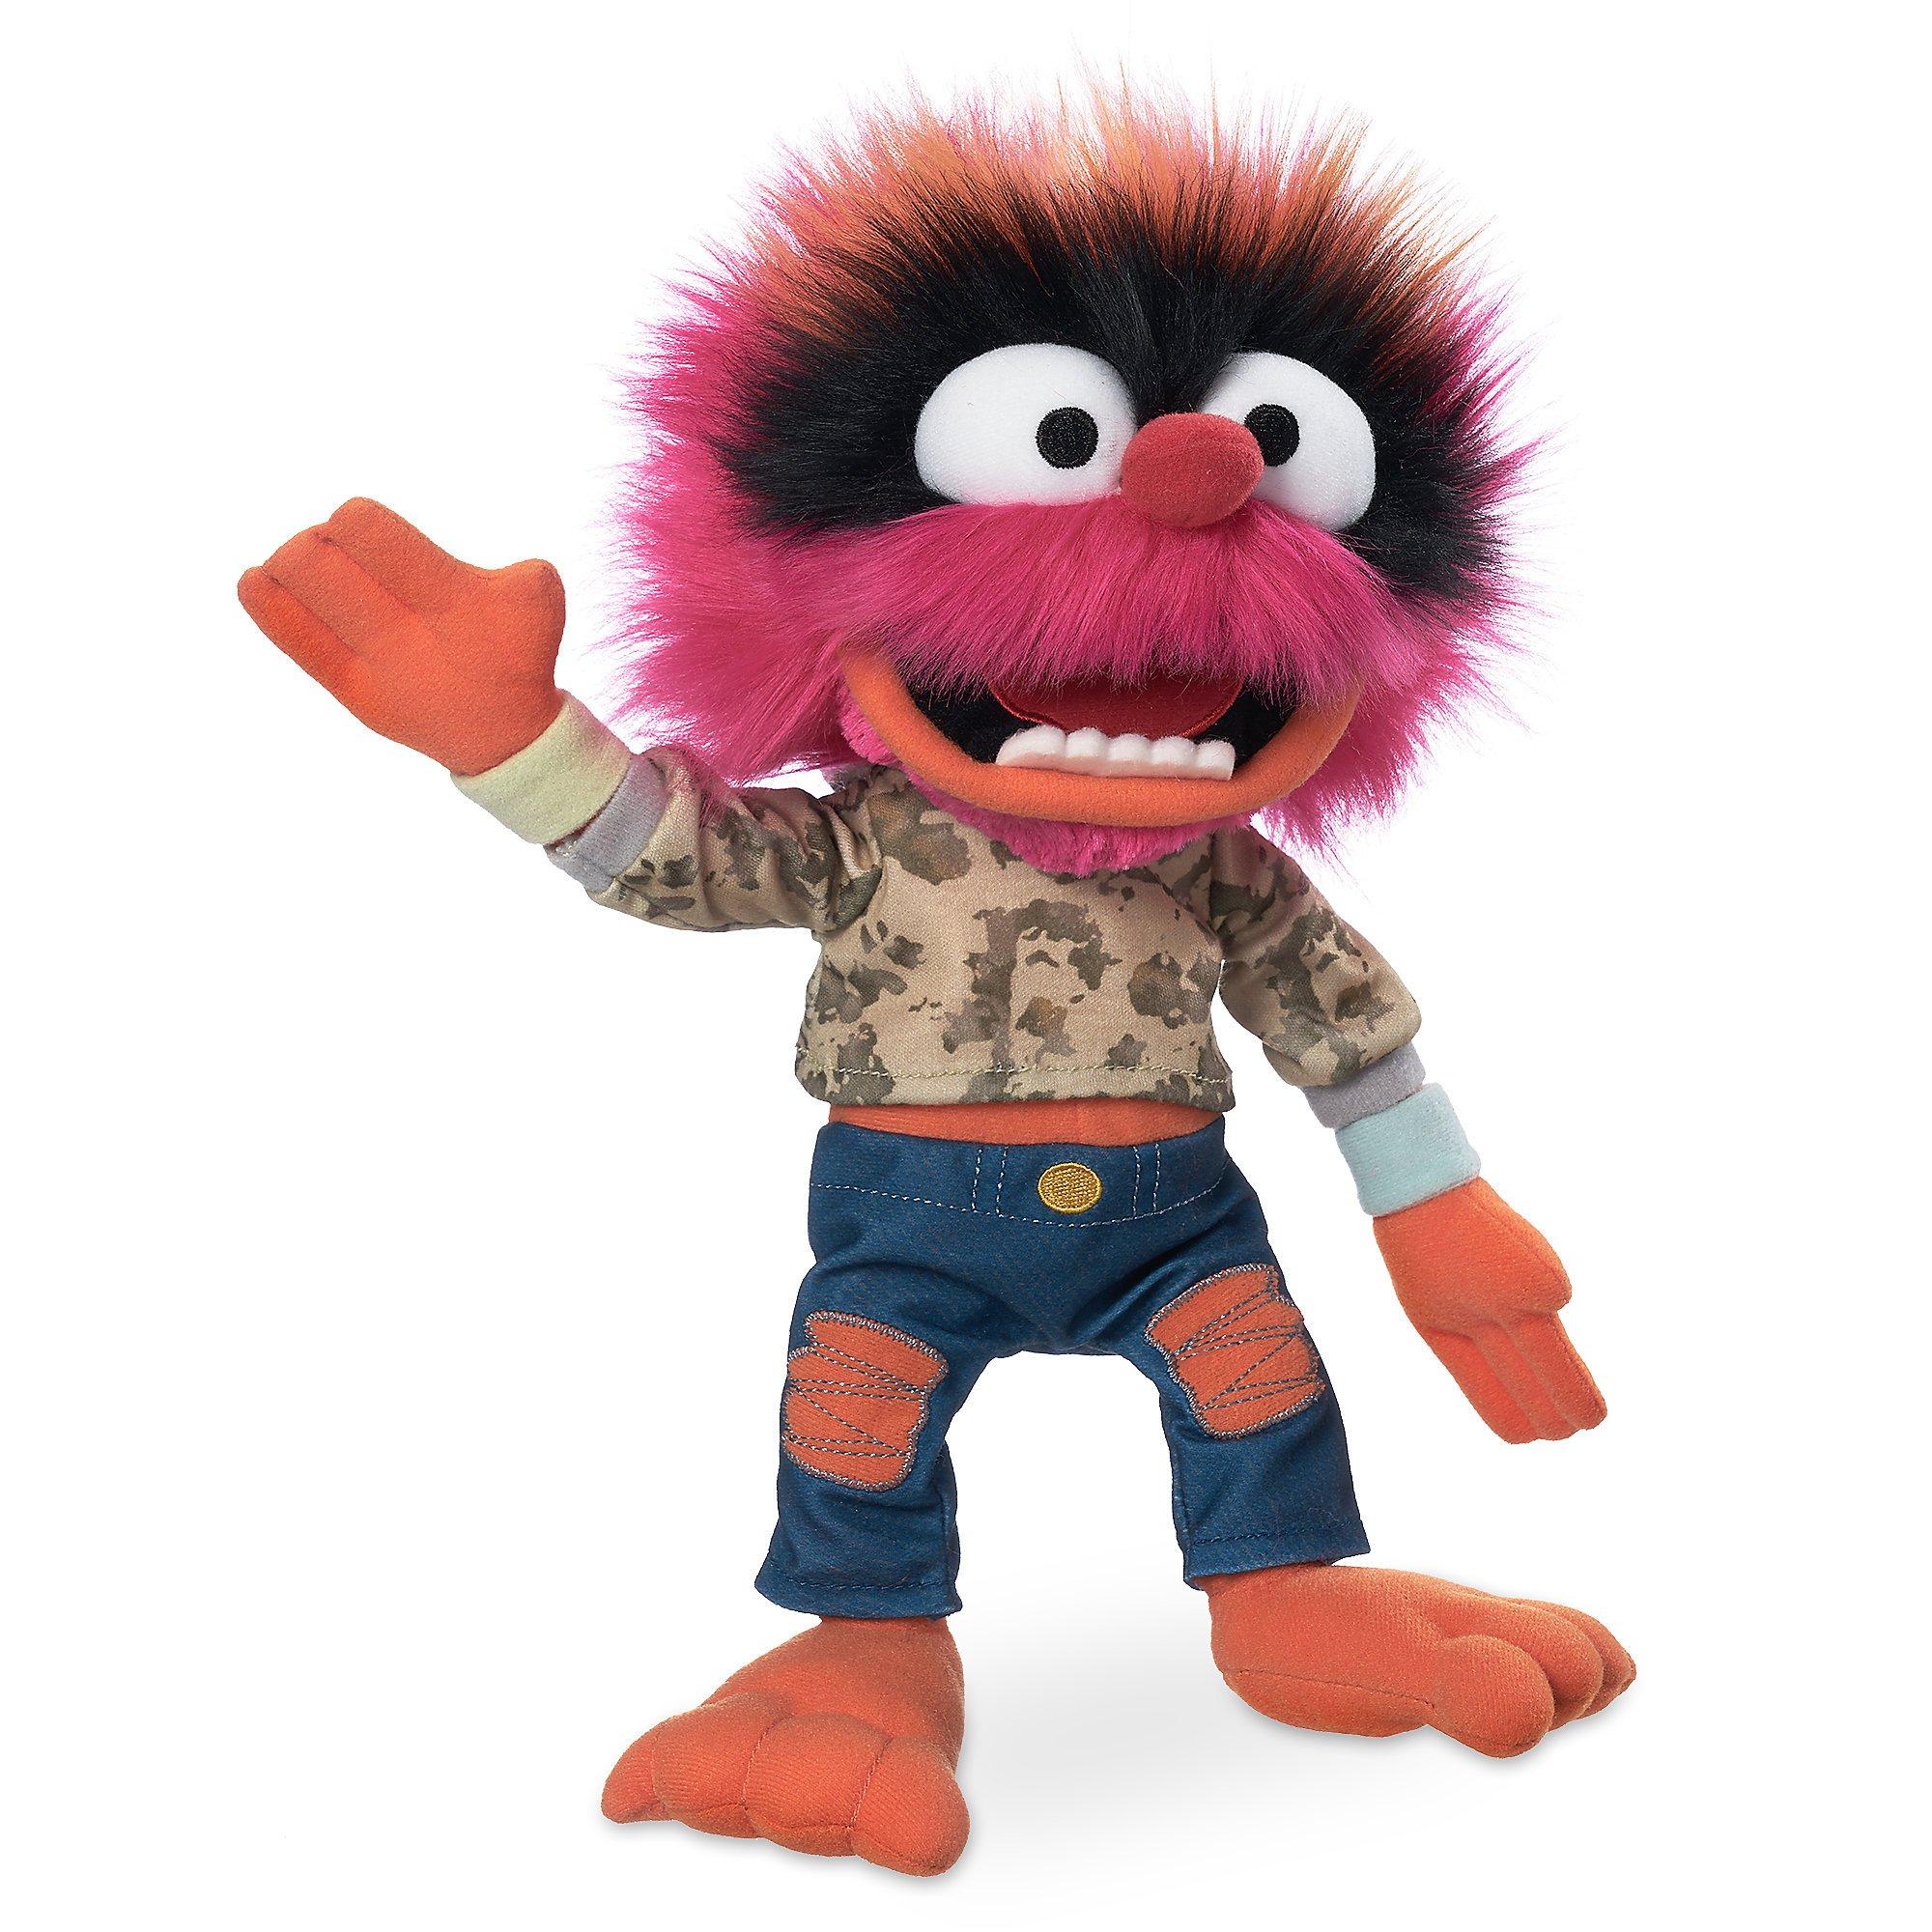 Disney Animal Plush - Muppet Babies - Small by Disney